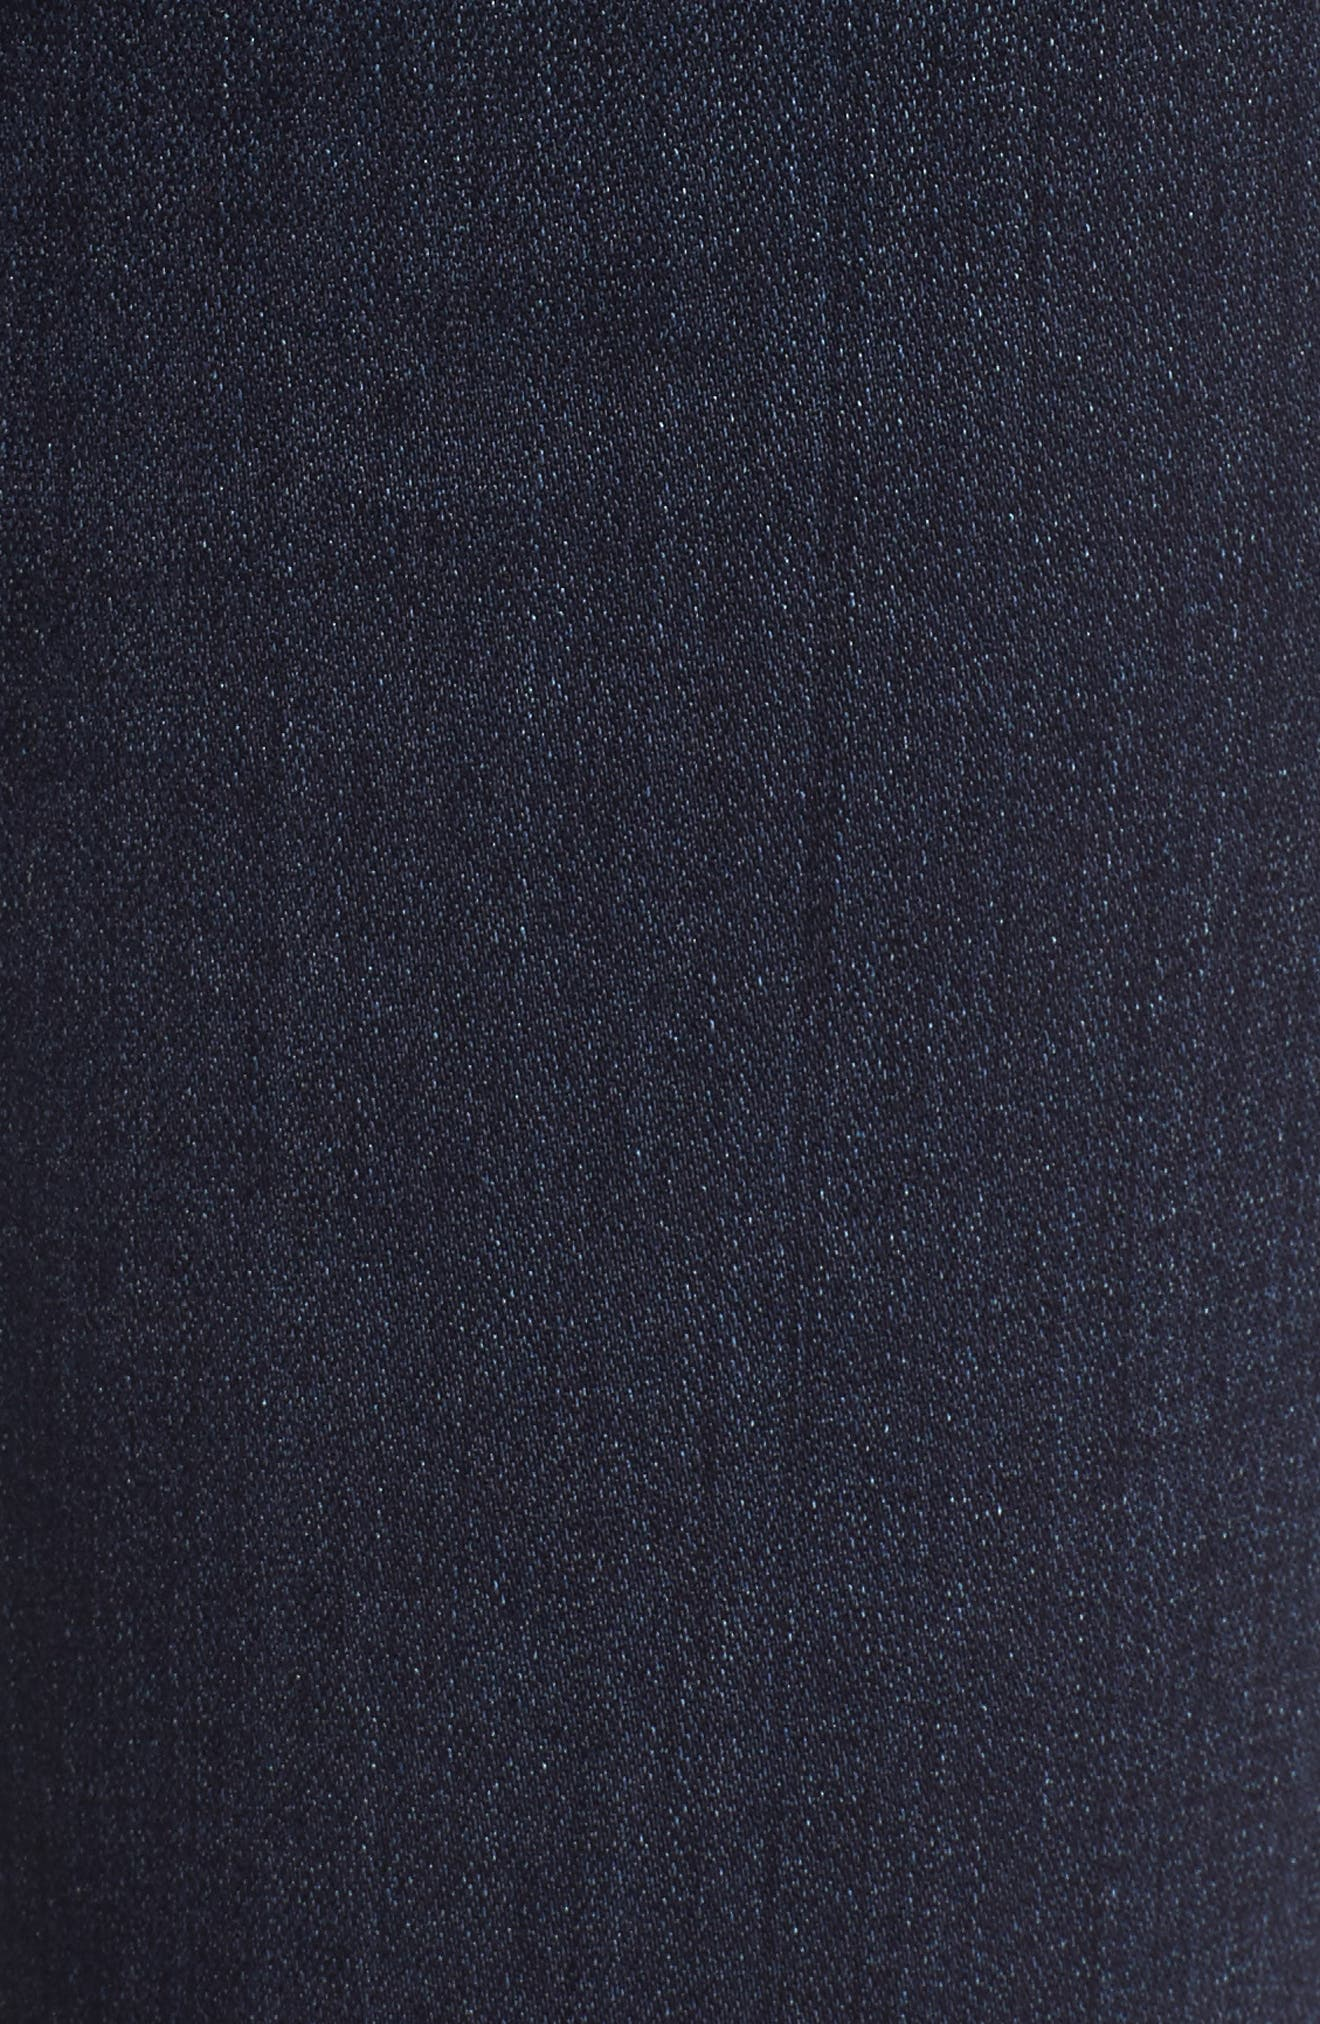 Transcend - Verdugo Ultra Skinny Jeans,                             Alternate thumbnail 5, color,